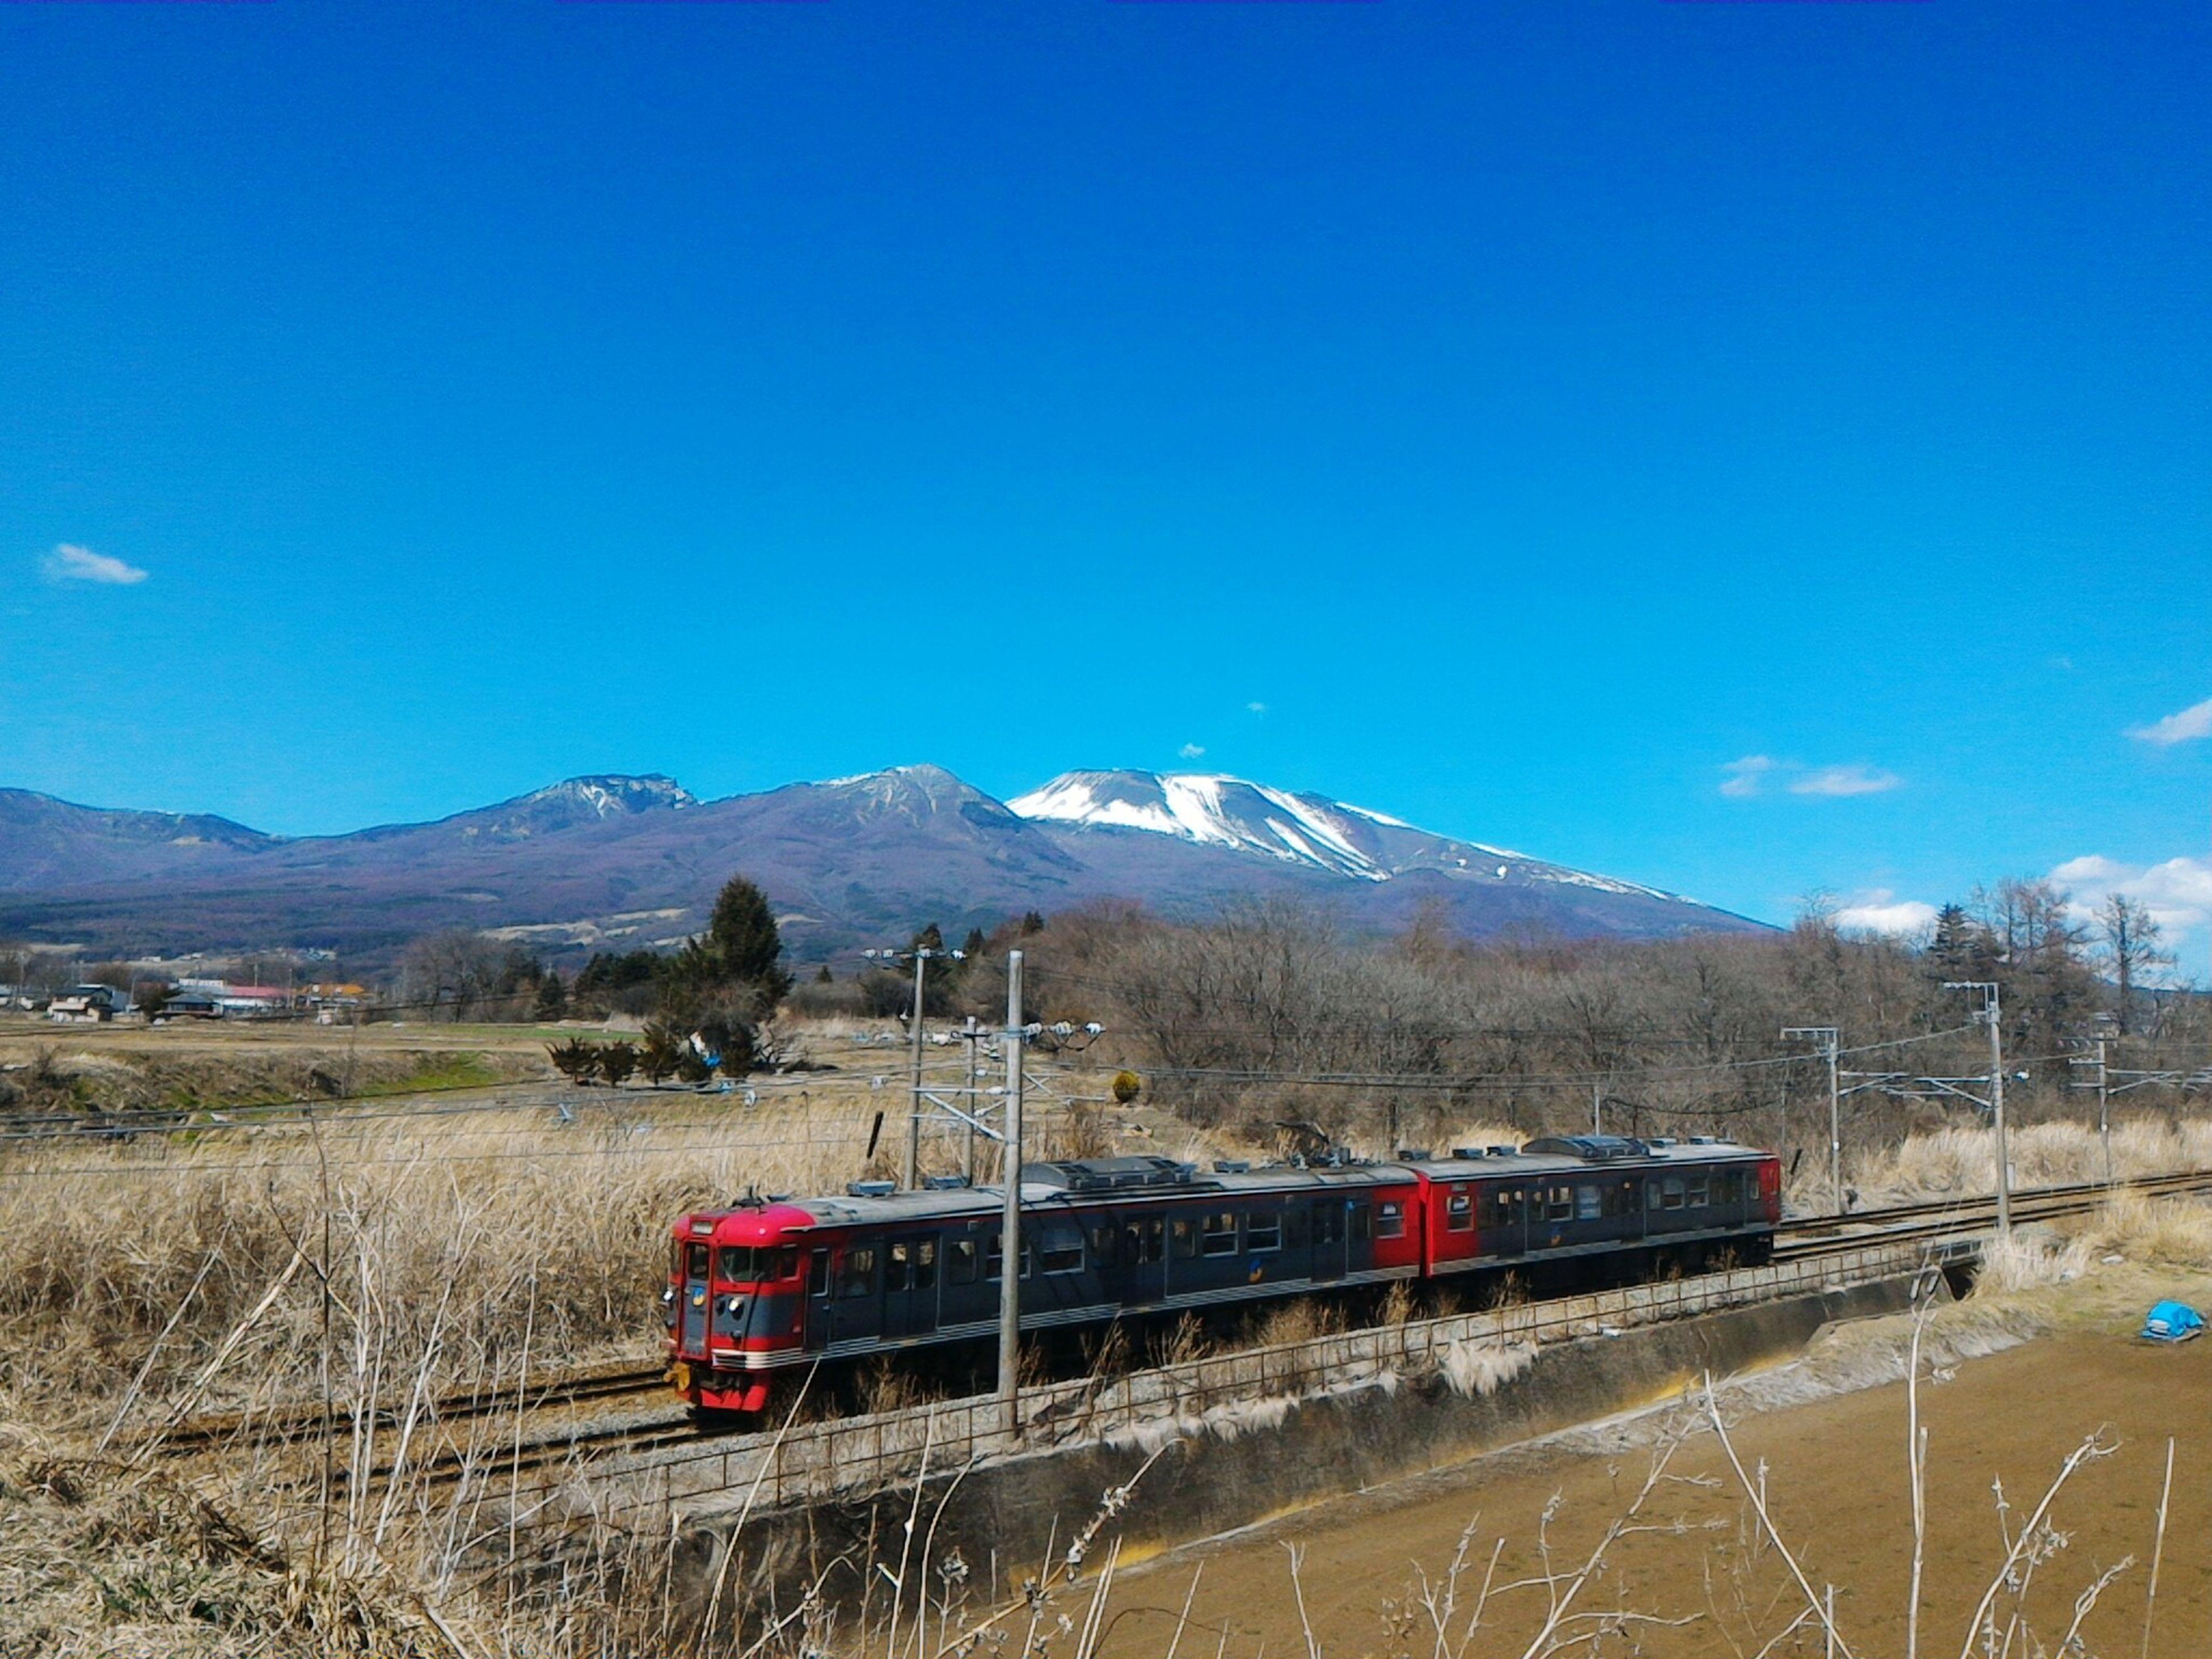 Shinano Railway Shinano Railroad Electric Train Mount Asama Mt Asama Volcano in Nagano , Japan